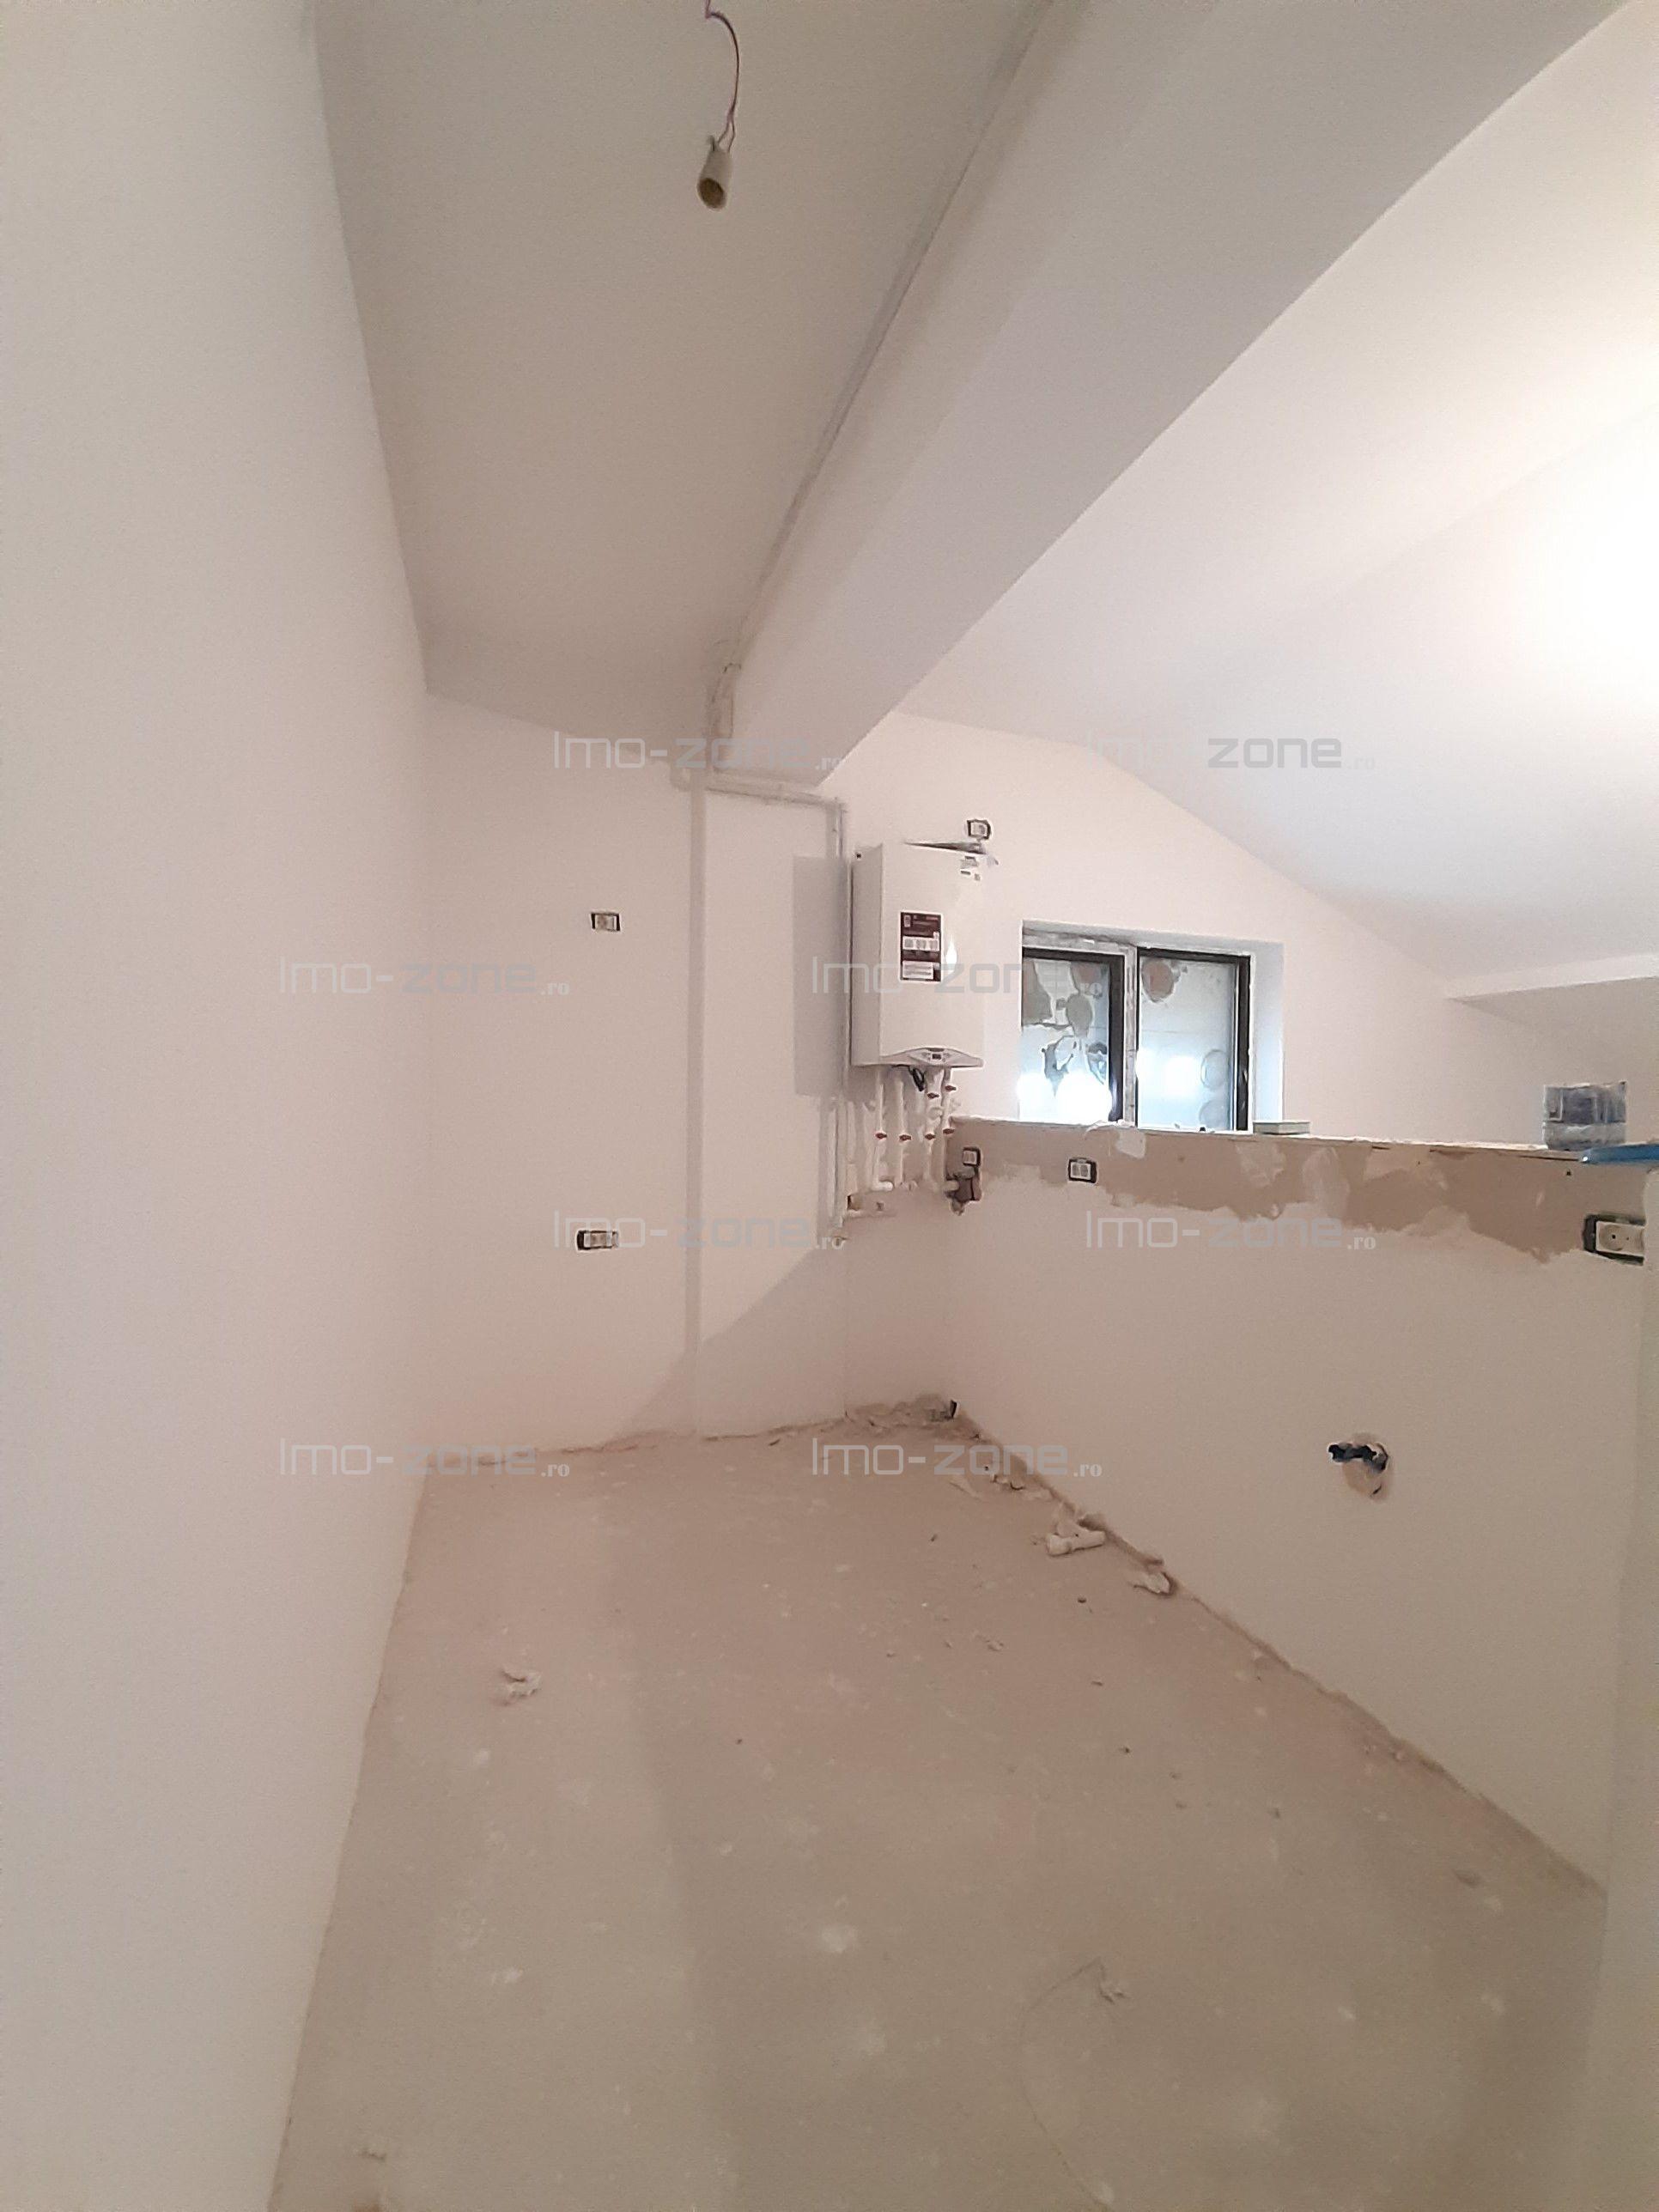 Apartament 2 camere, 51 mp, finalizat, Drumul Taberei, comision 0%, plata cash